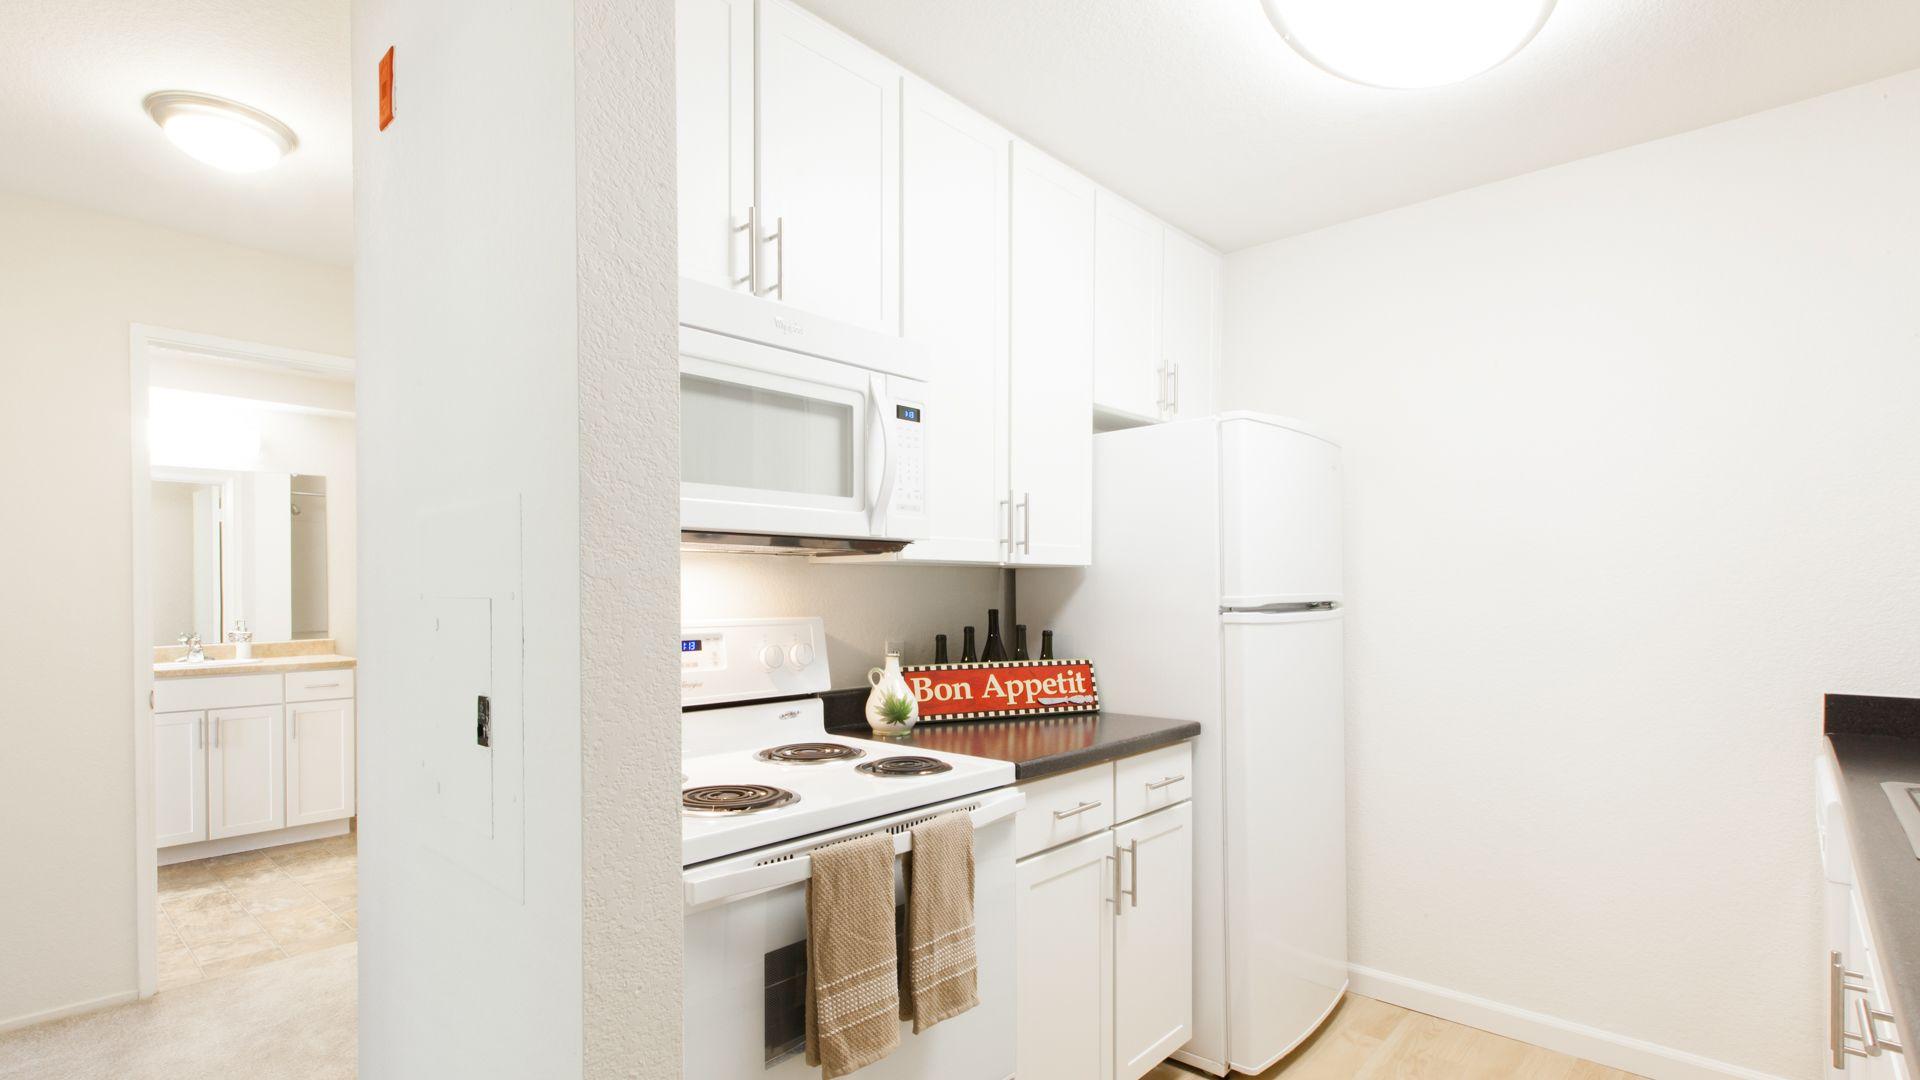 Artistry Emeryville Apartments - Kitchen